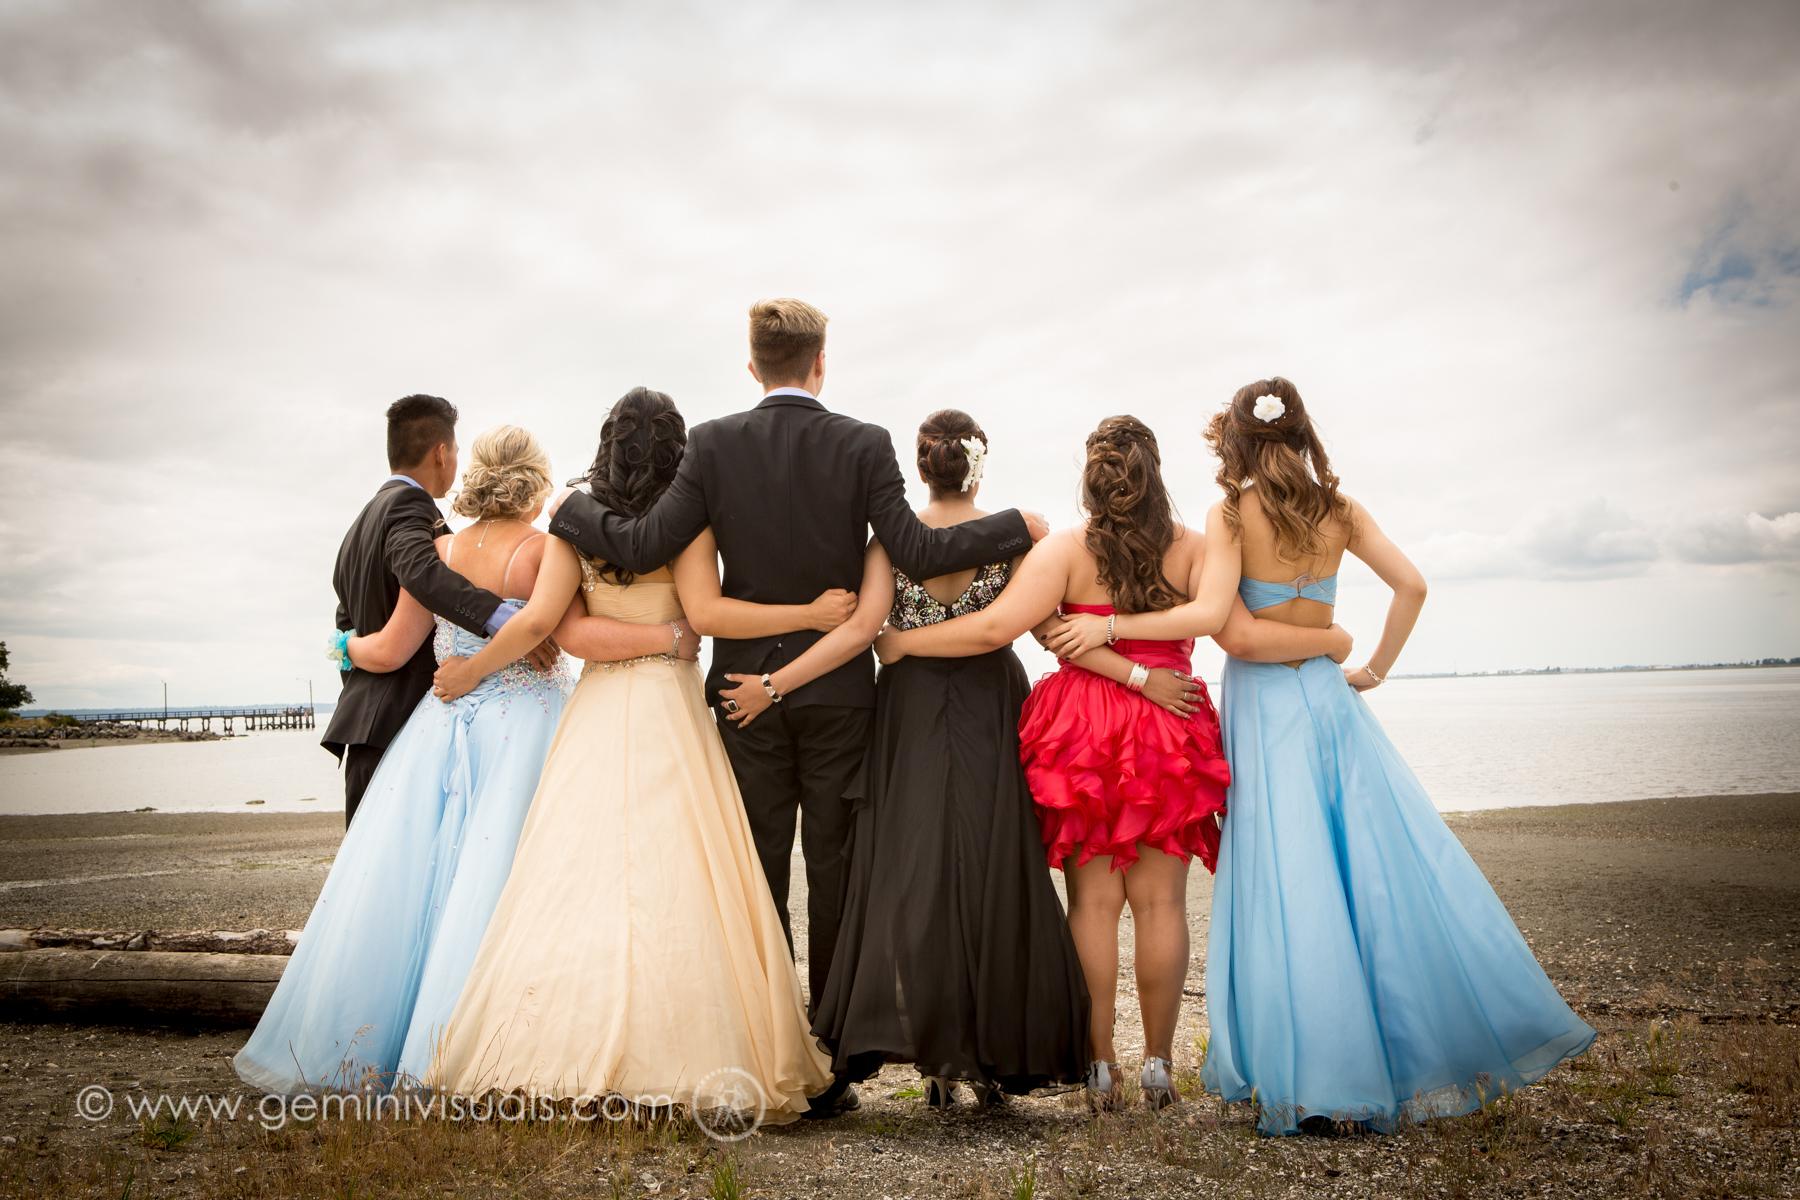 Grad Year photos, Prom Photos, Surrey Grad photographer, Gemini Visuals